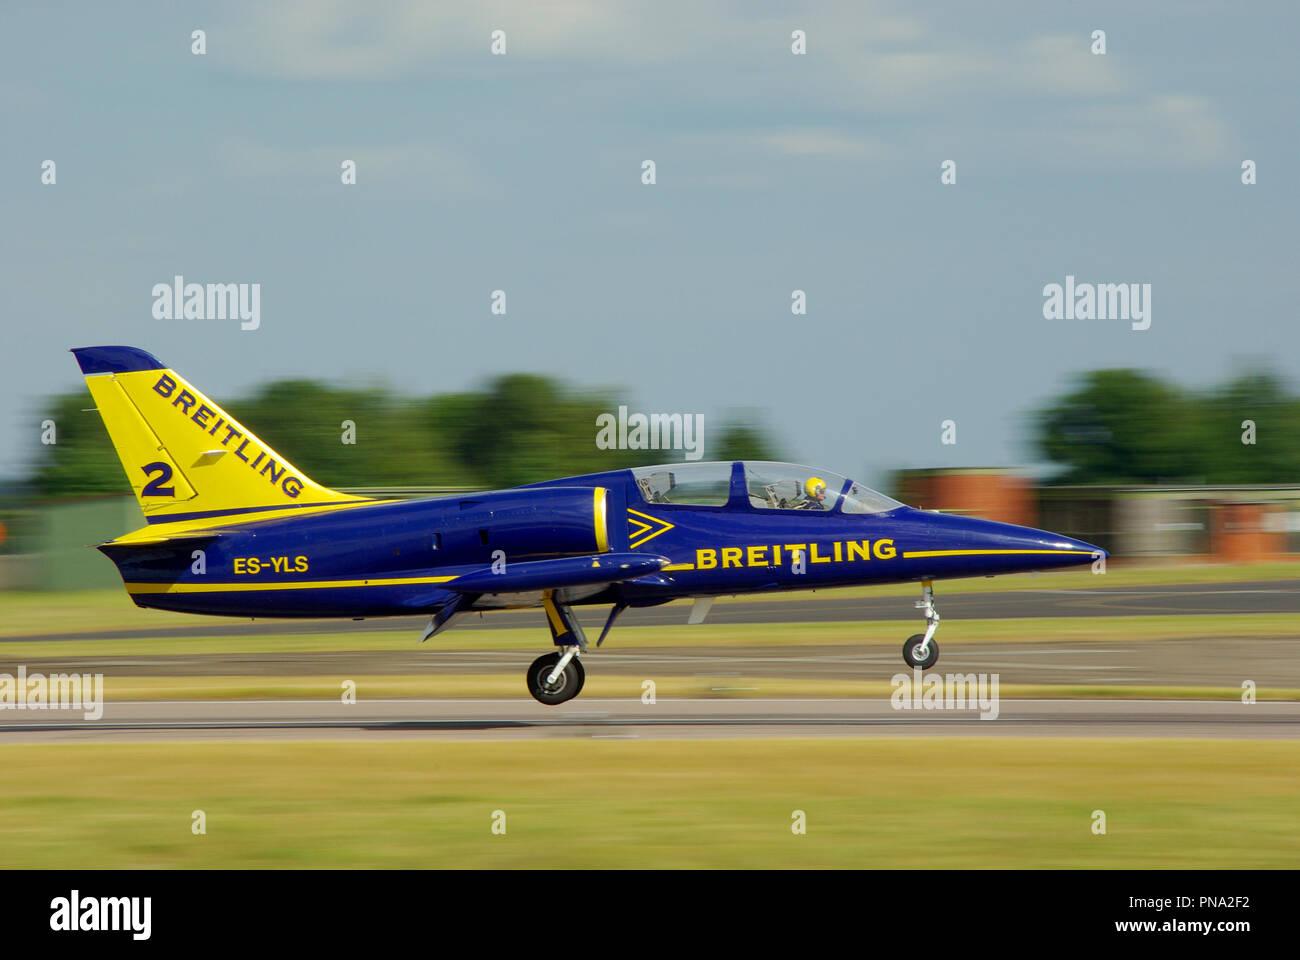 Breitling Jet Team L-39 jet plane landing after displaying at RAF Waddington airshow. Aerovodochody Aero L-39 Albatros jet - Stock Image